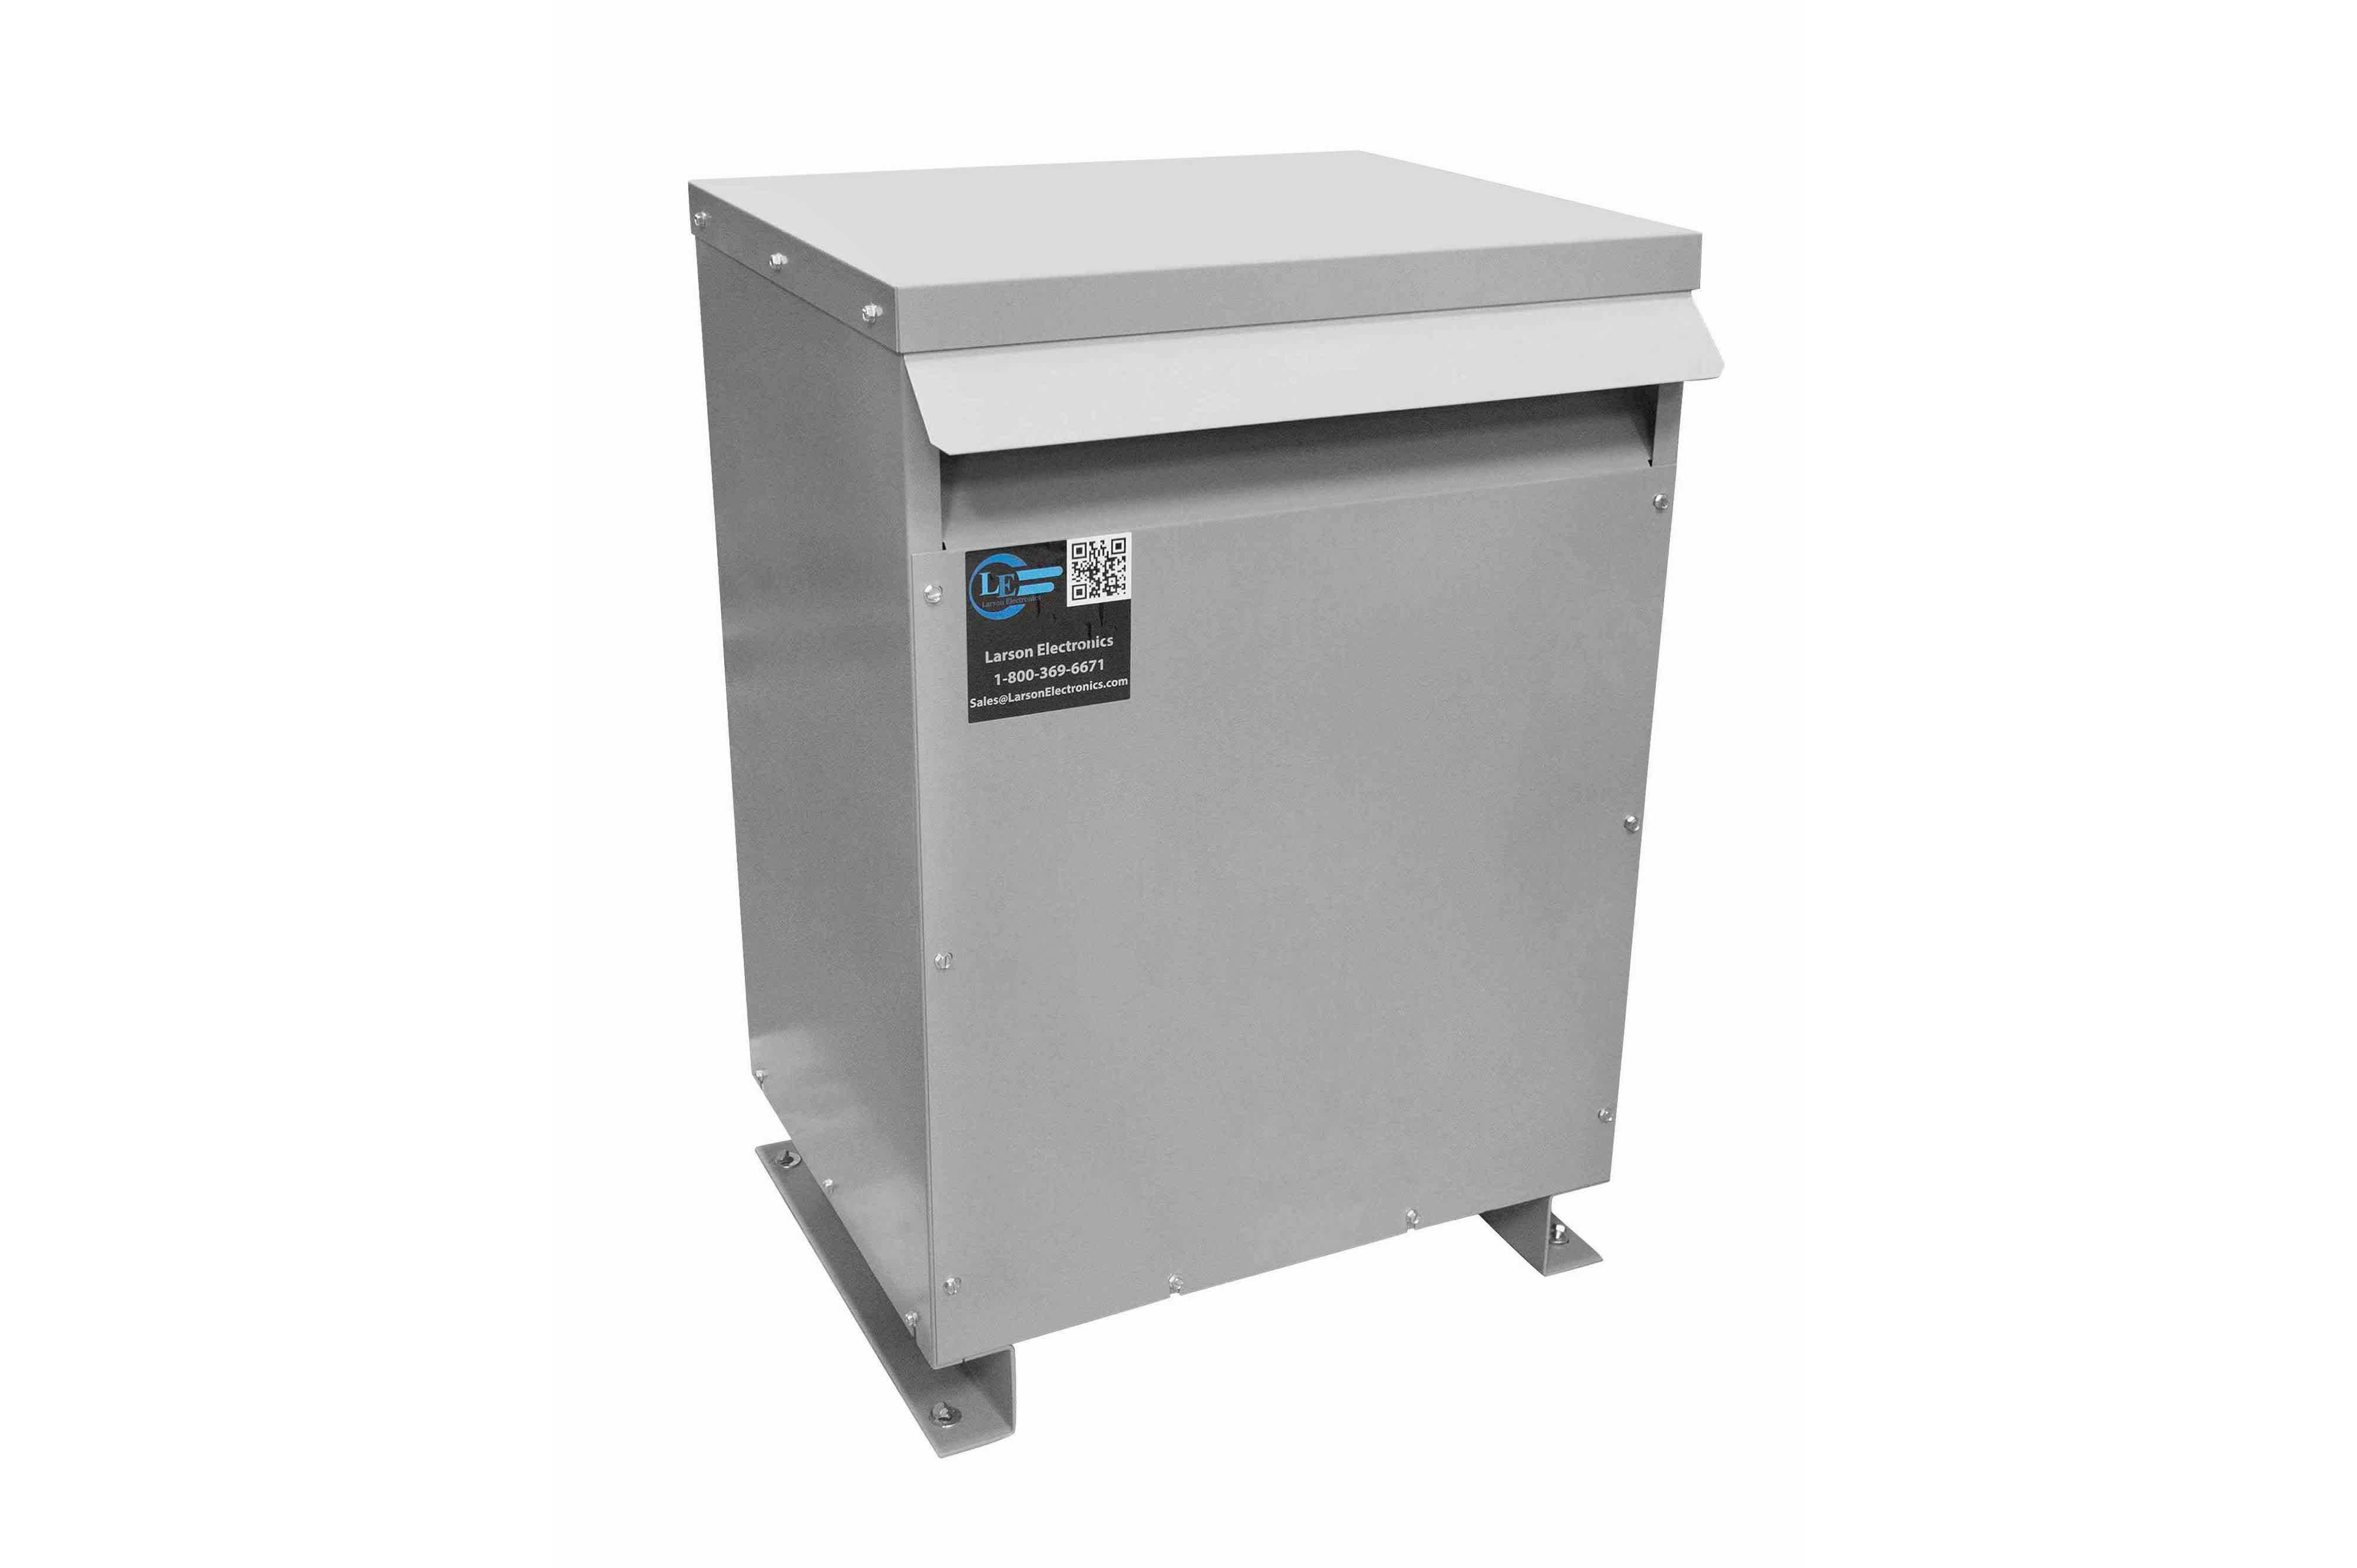 275 kVA 3PH Isolation Transformer, 460V Wye Primary, 400Y/231 Wye-N Secondary, N3R, Ventilated, 60 Hz